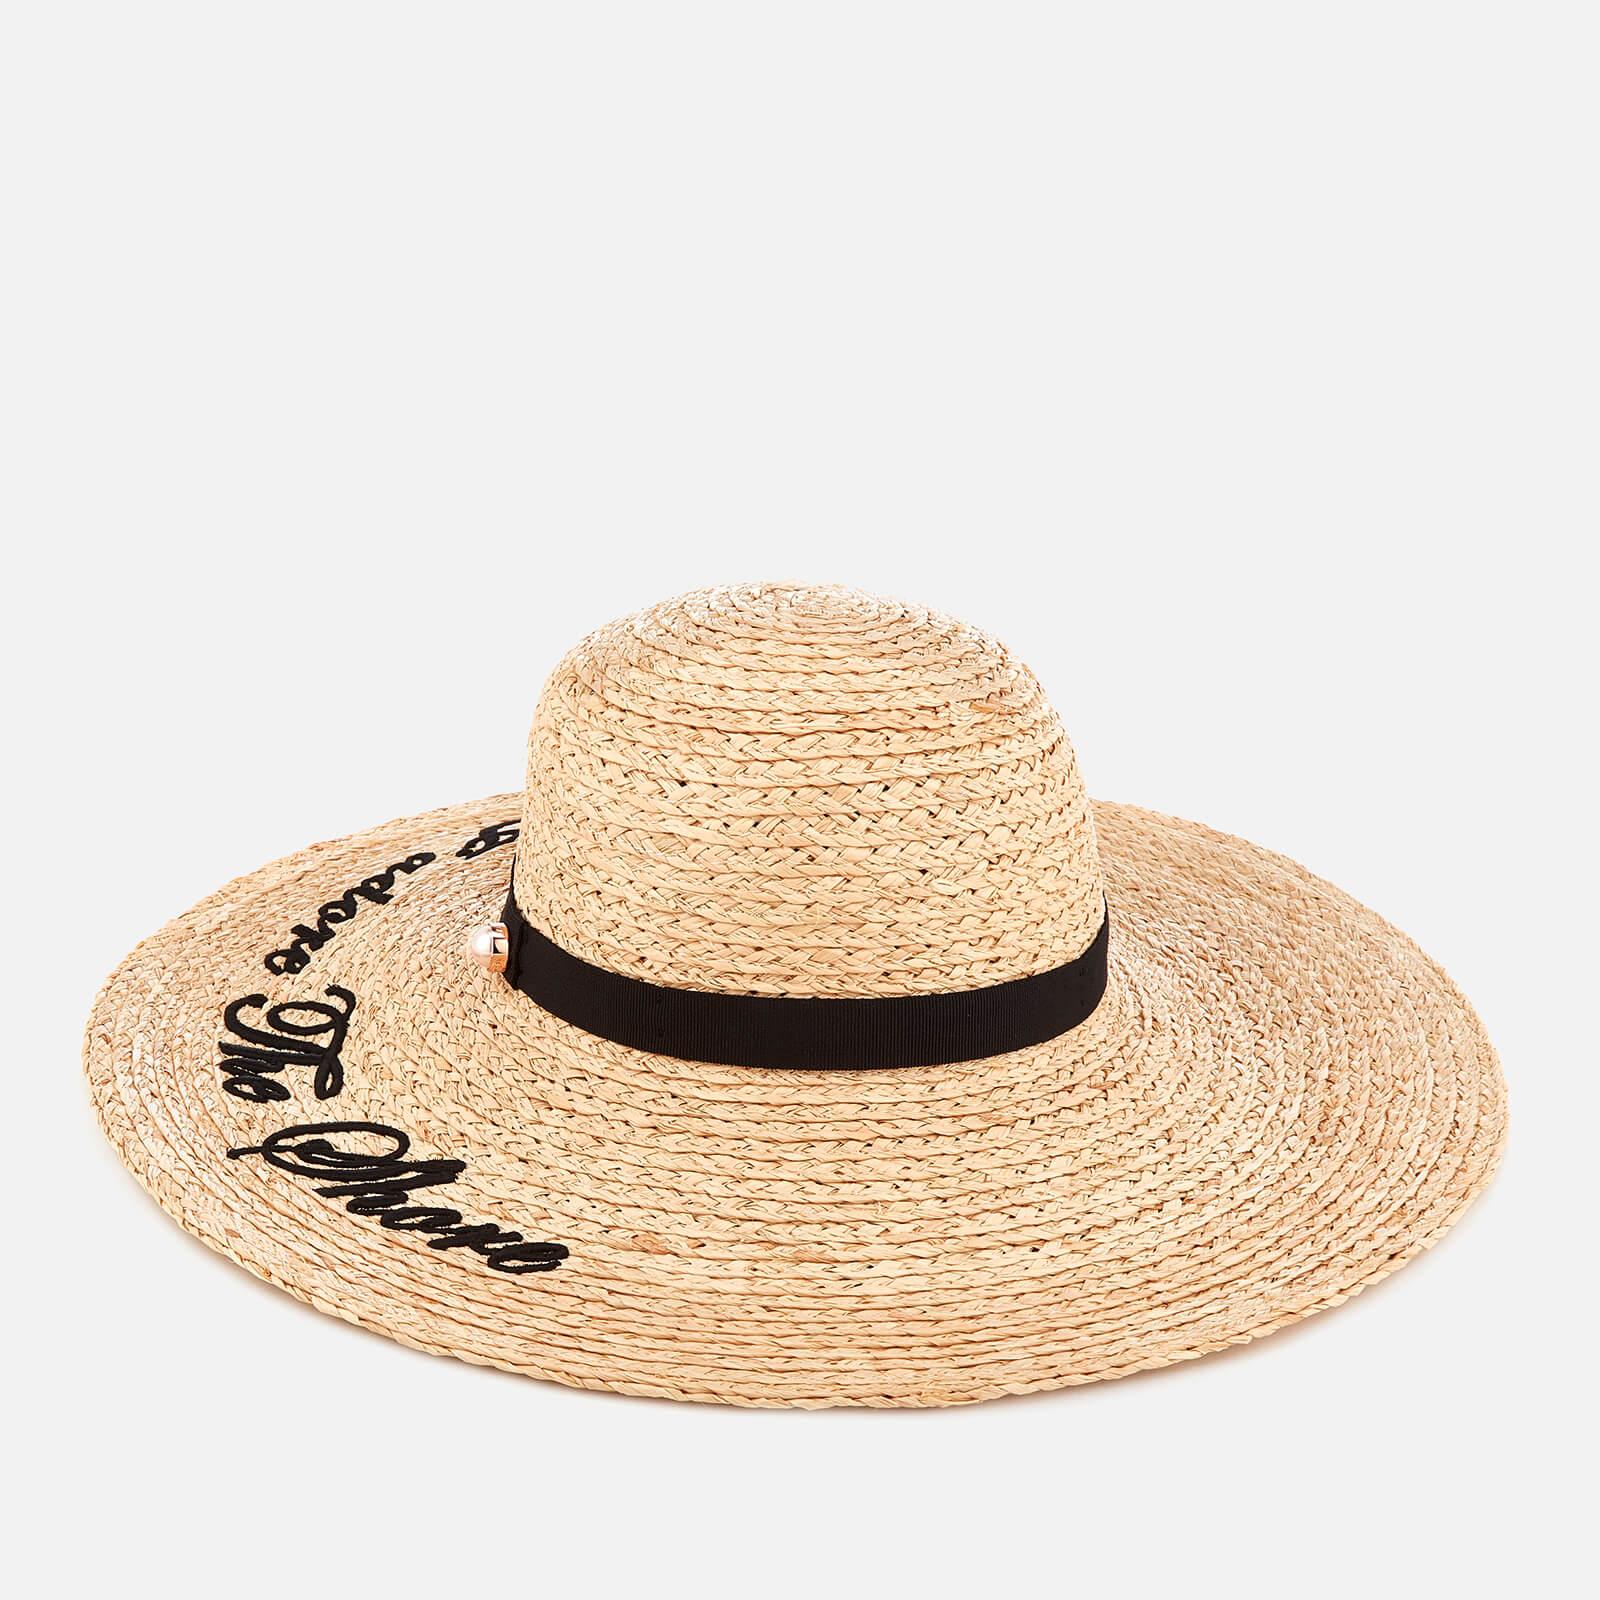 86e861031 Ted Baker Women's Albizia Script Embroidered Floppy Hat - Straw